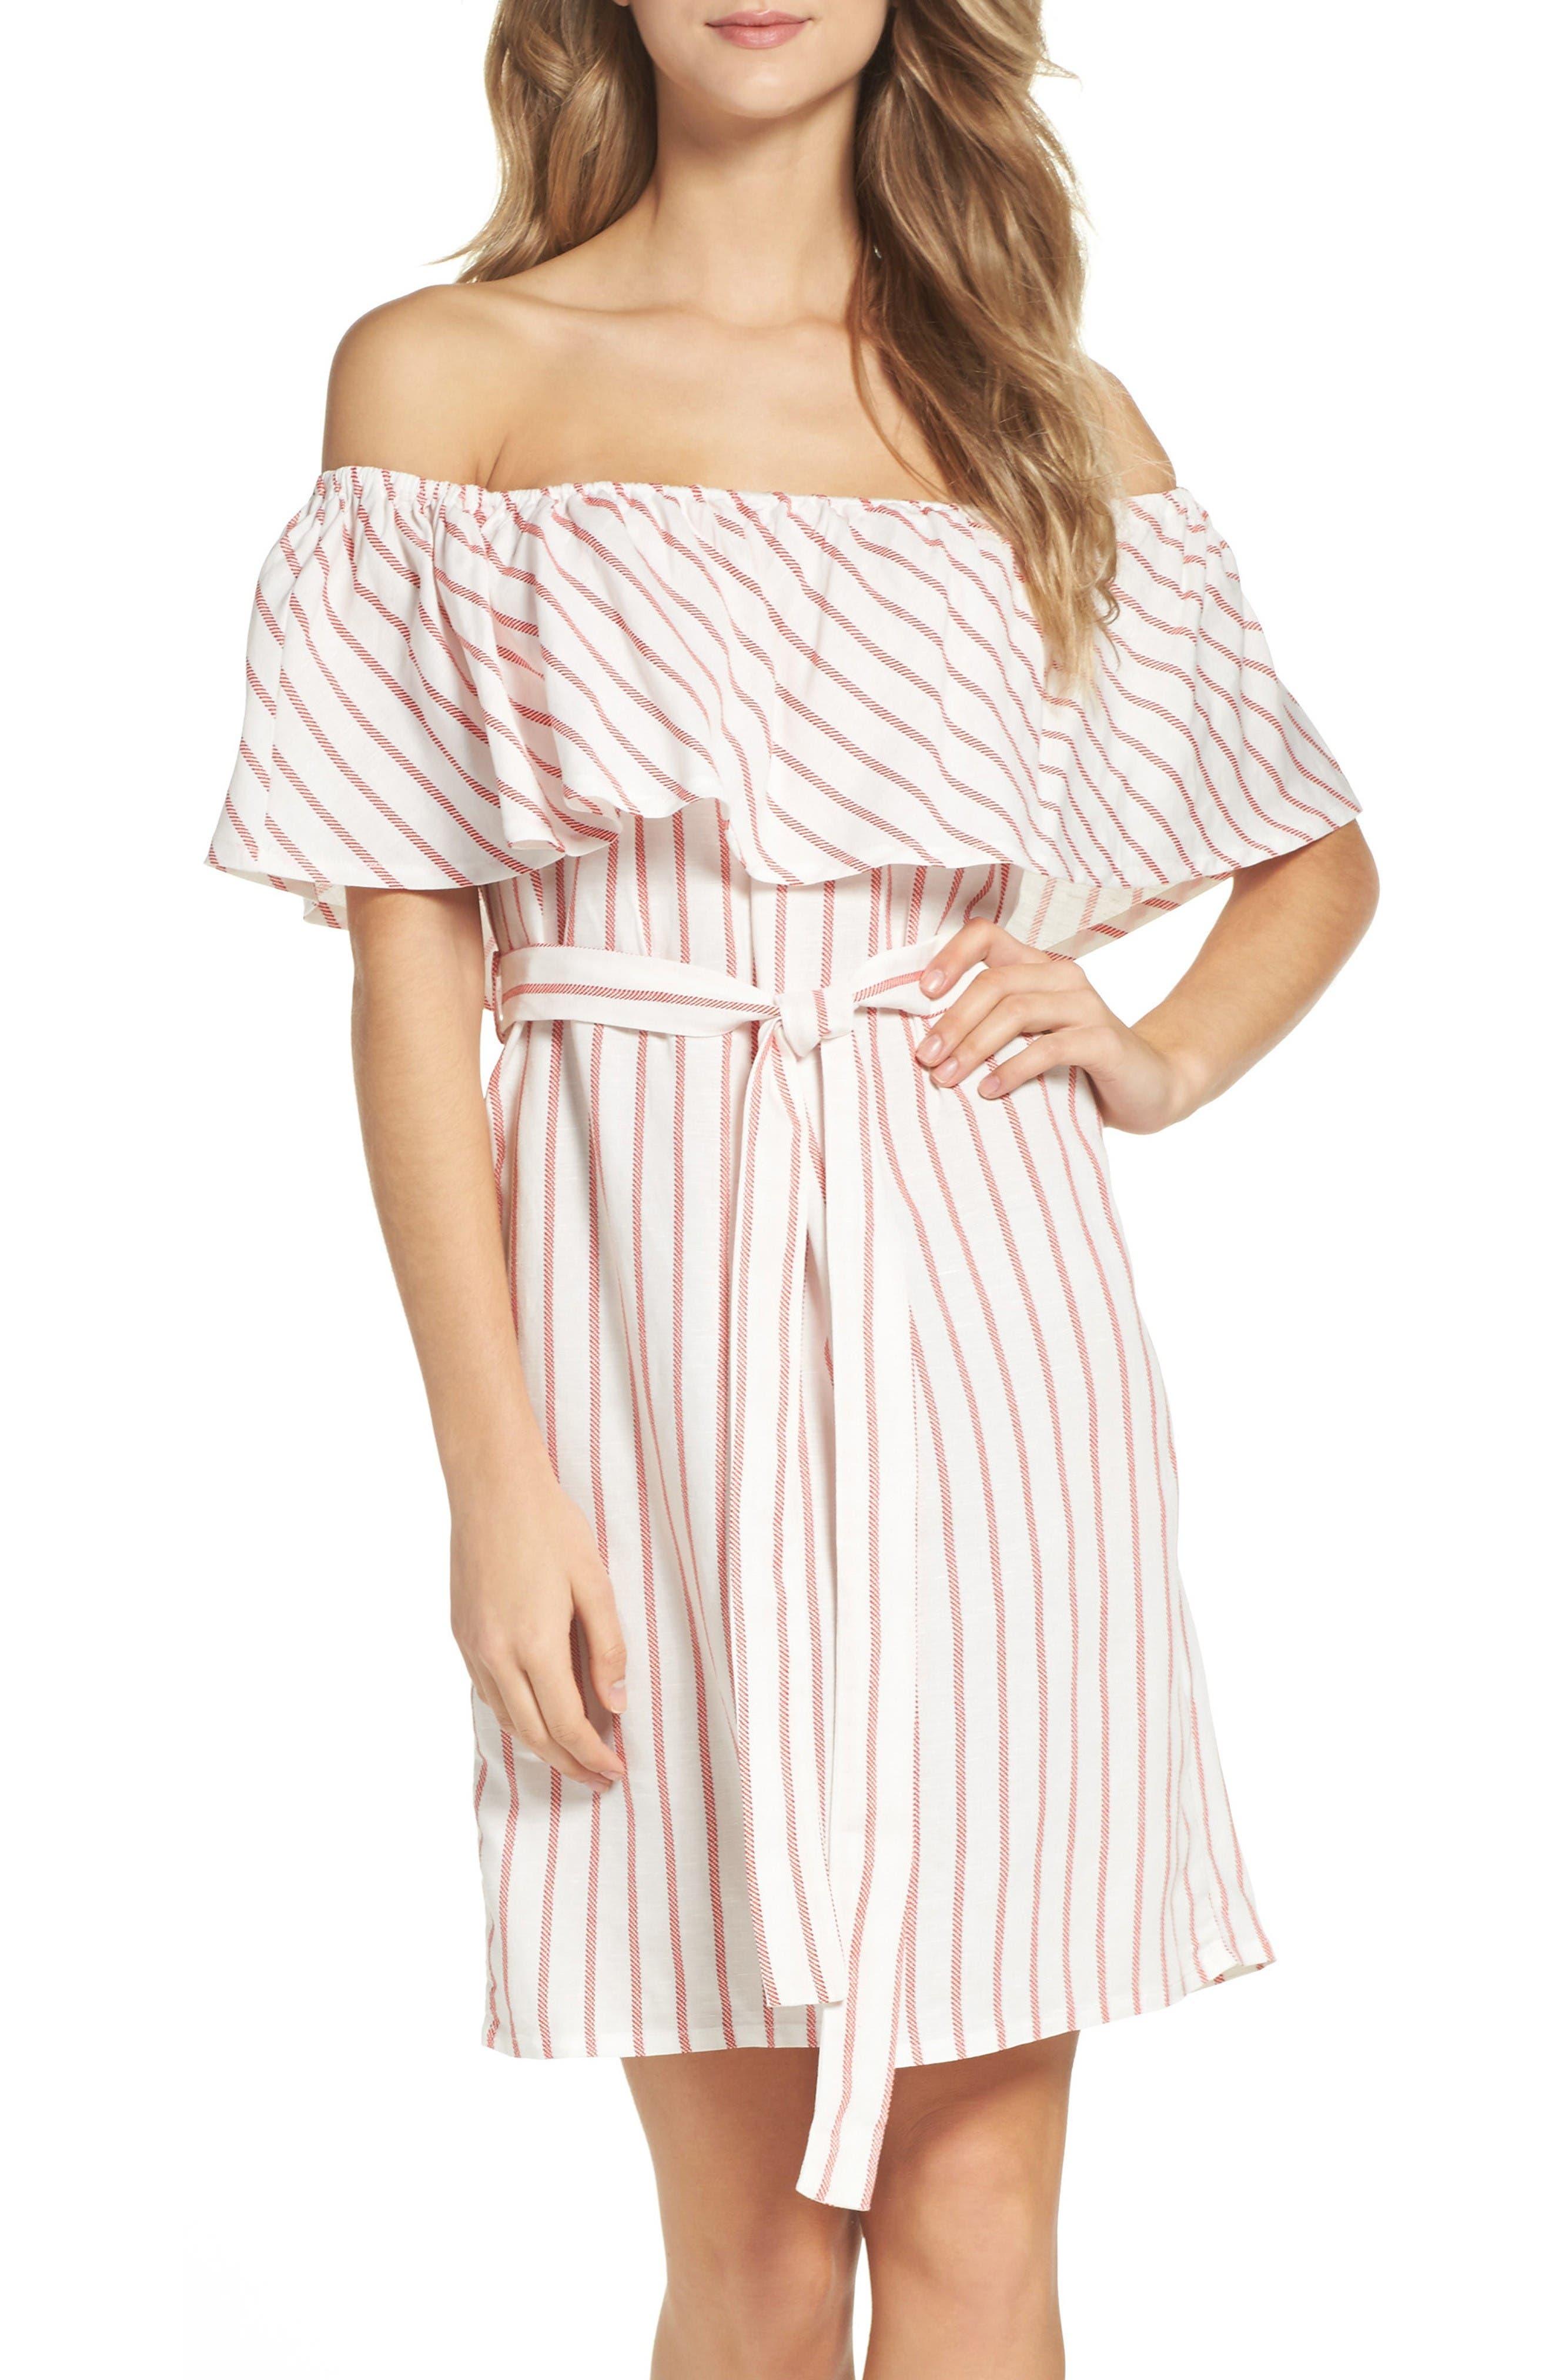 Alternate Image 1 Selected - Bardot Capri Off the Shoulder Dress